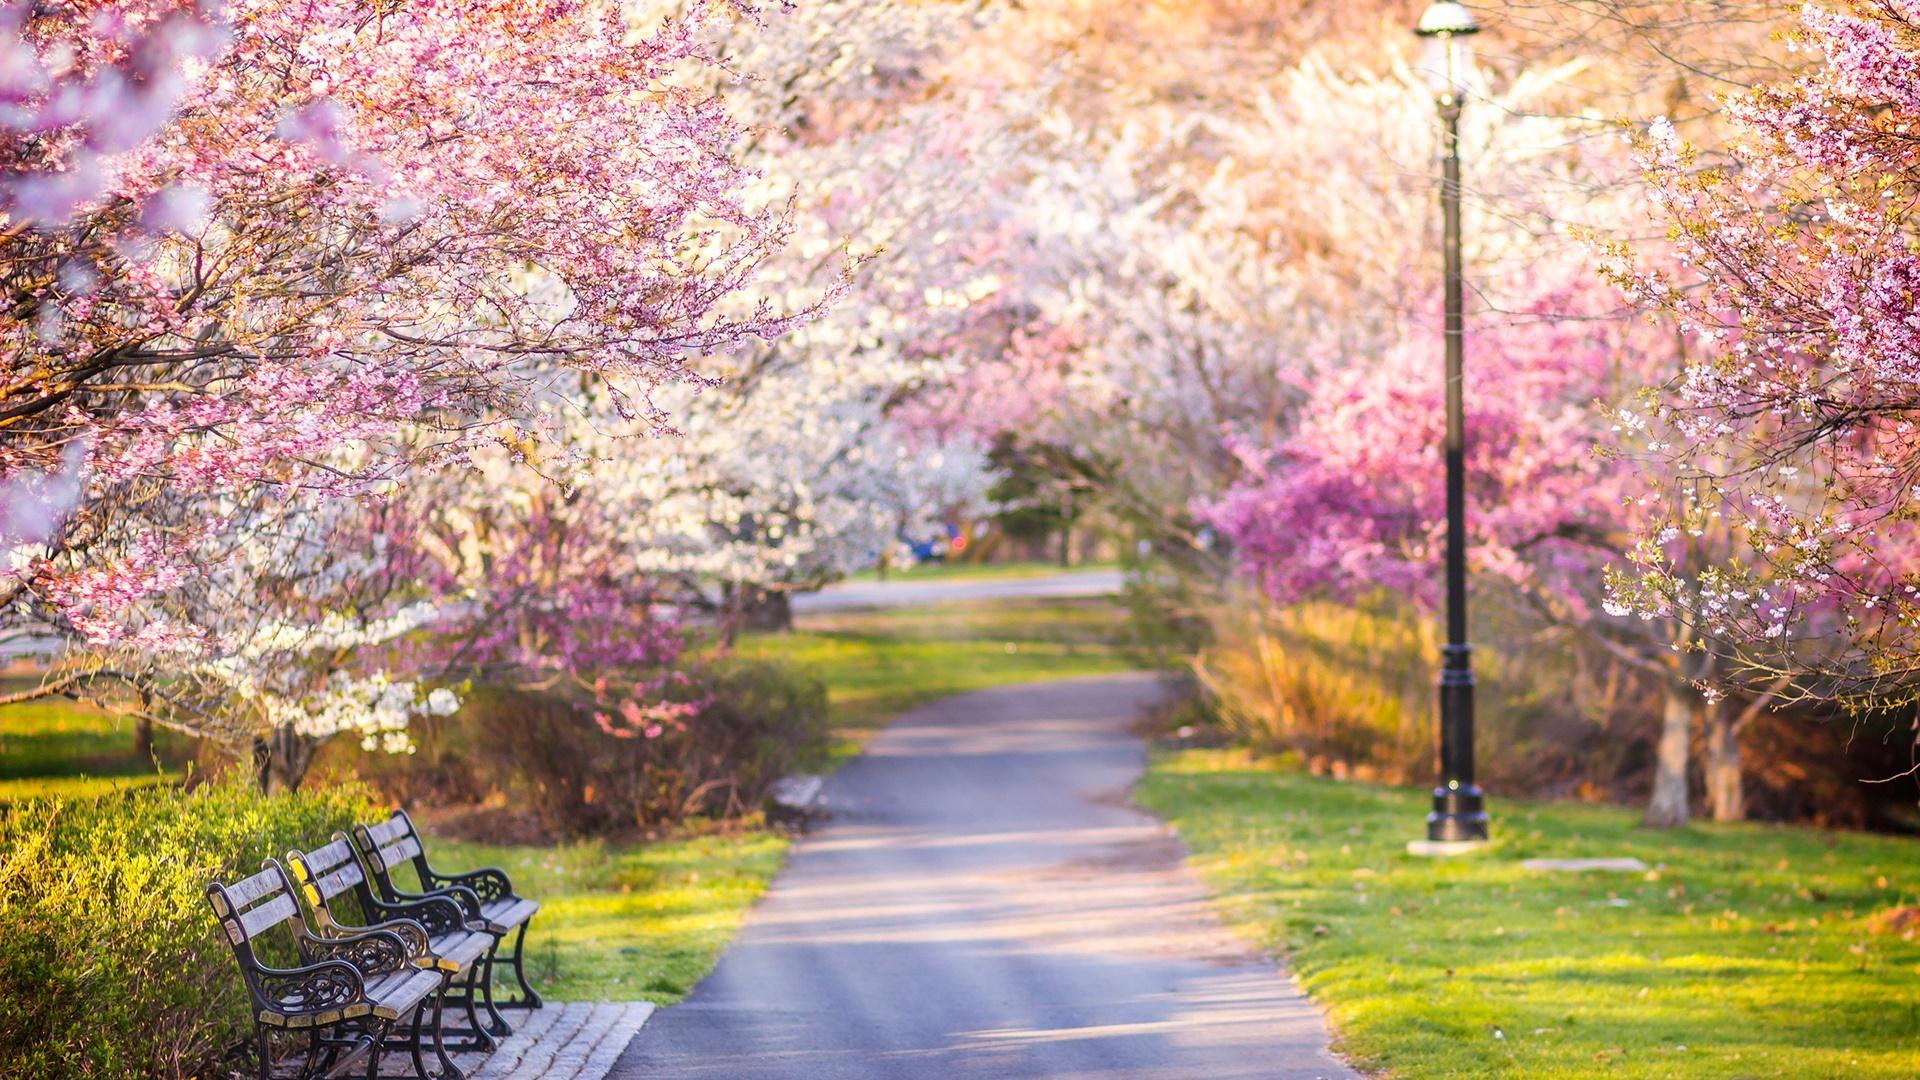 Cherry blossom wallpaper - backiee